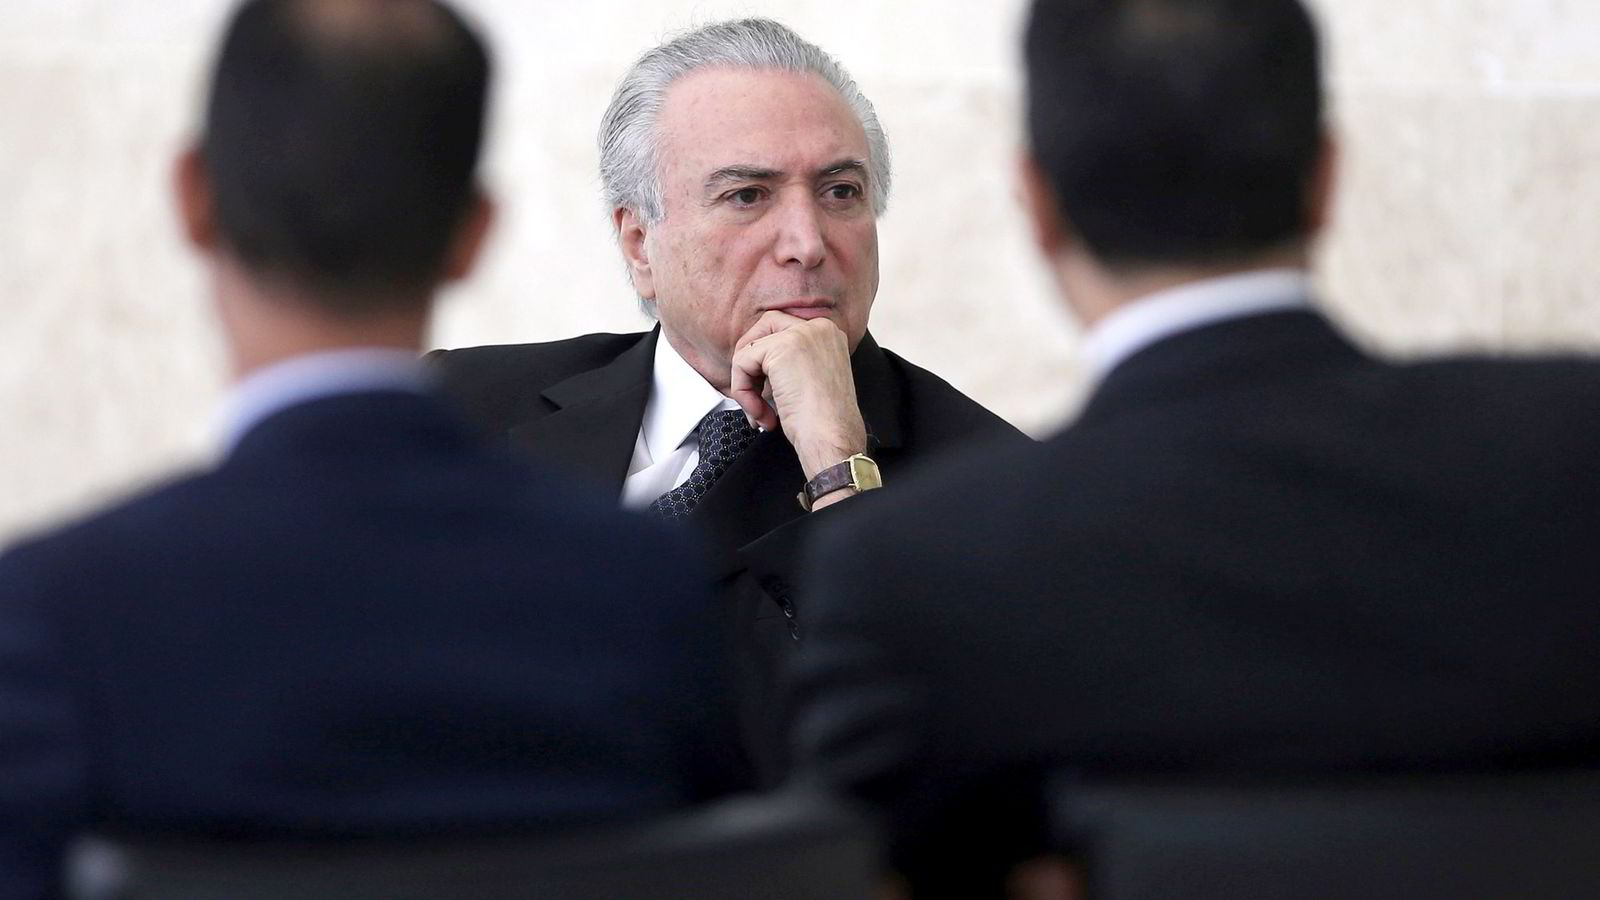 Brasils hardt pressede president Michel Temer her under en diplomatisk seremoni i Brasils hovedstad Brasilia forrige uke. Foto: REUTERS/Adriano Machado/NTB Scanpix